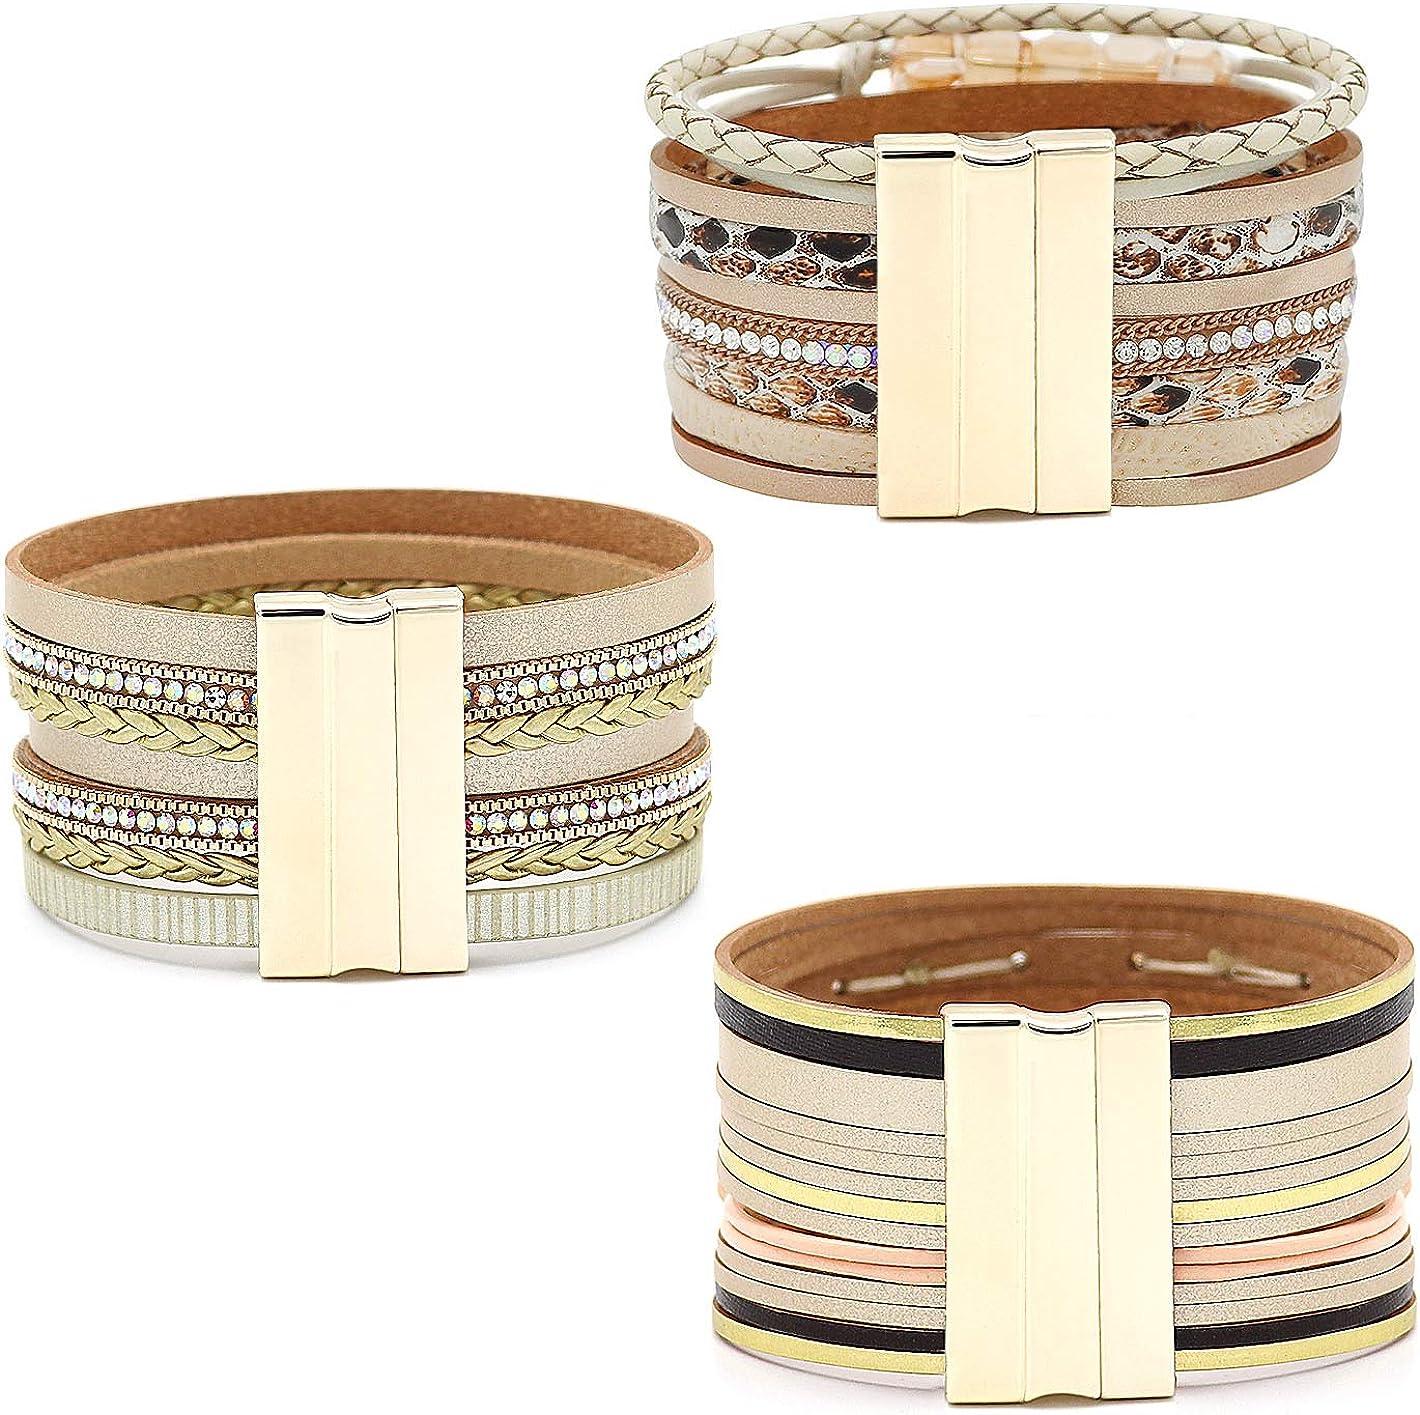 Wowanoo 3Pack Leather Cuff Bracelet Set Multilayer Wrap Bracelet Crystal Feather Tree Bracelet Magnetic Clasp Bracelet for Women